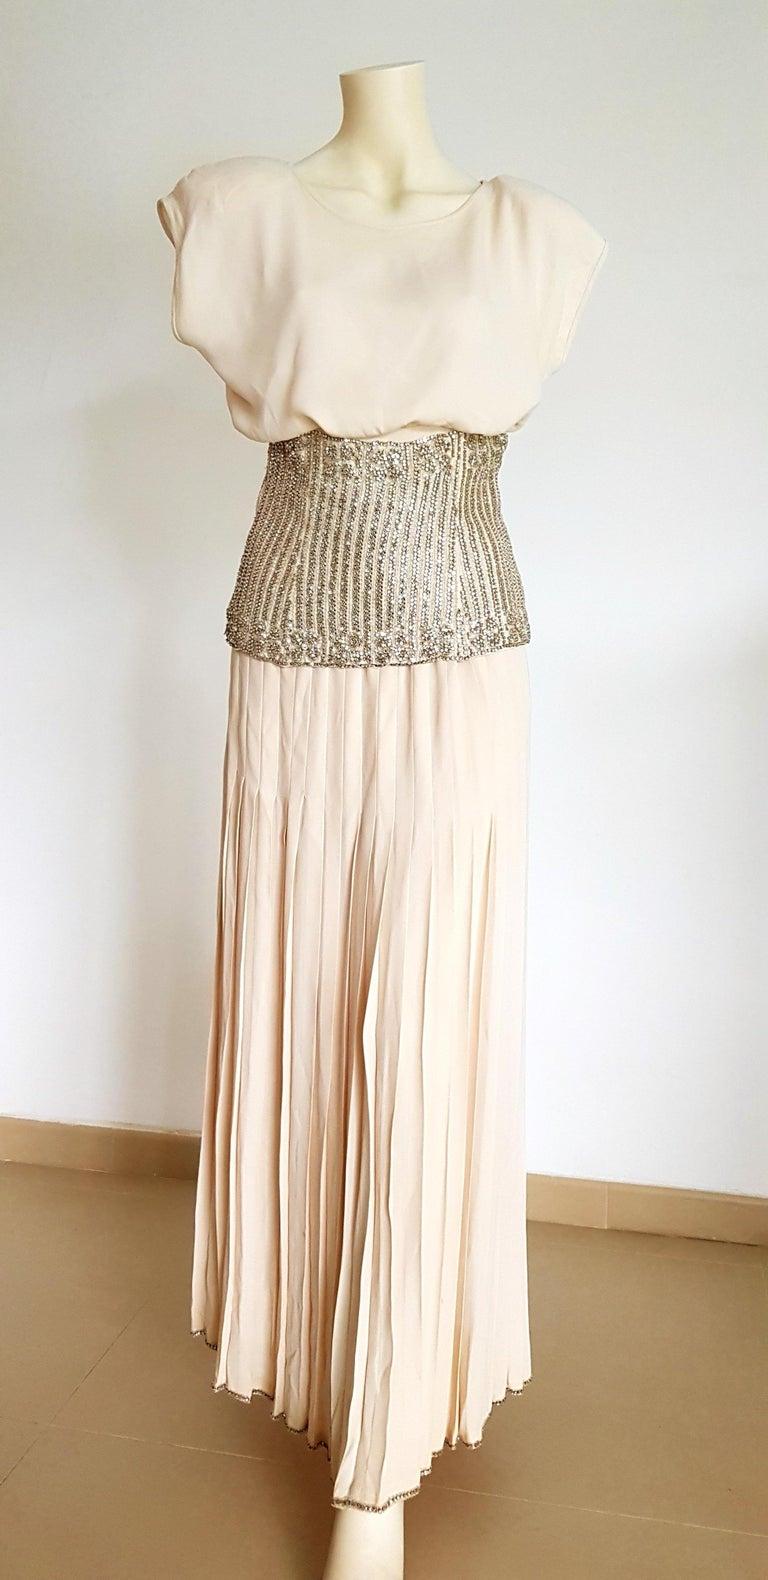 White VALENTINO Haute Couture Top Skirt Swarovski Diamonds Waistband Silk Dress-Unworn For Sale